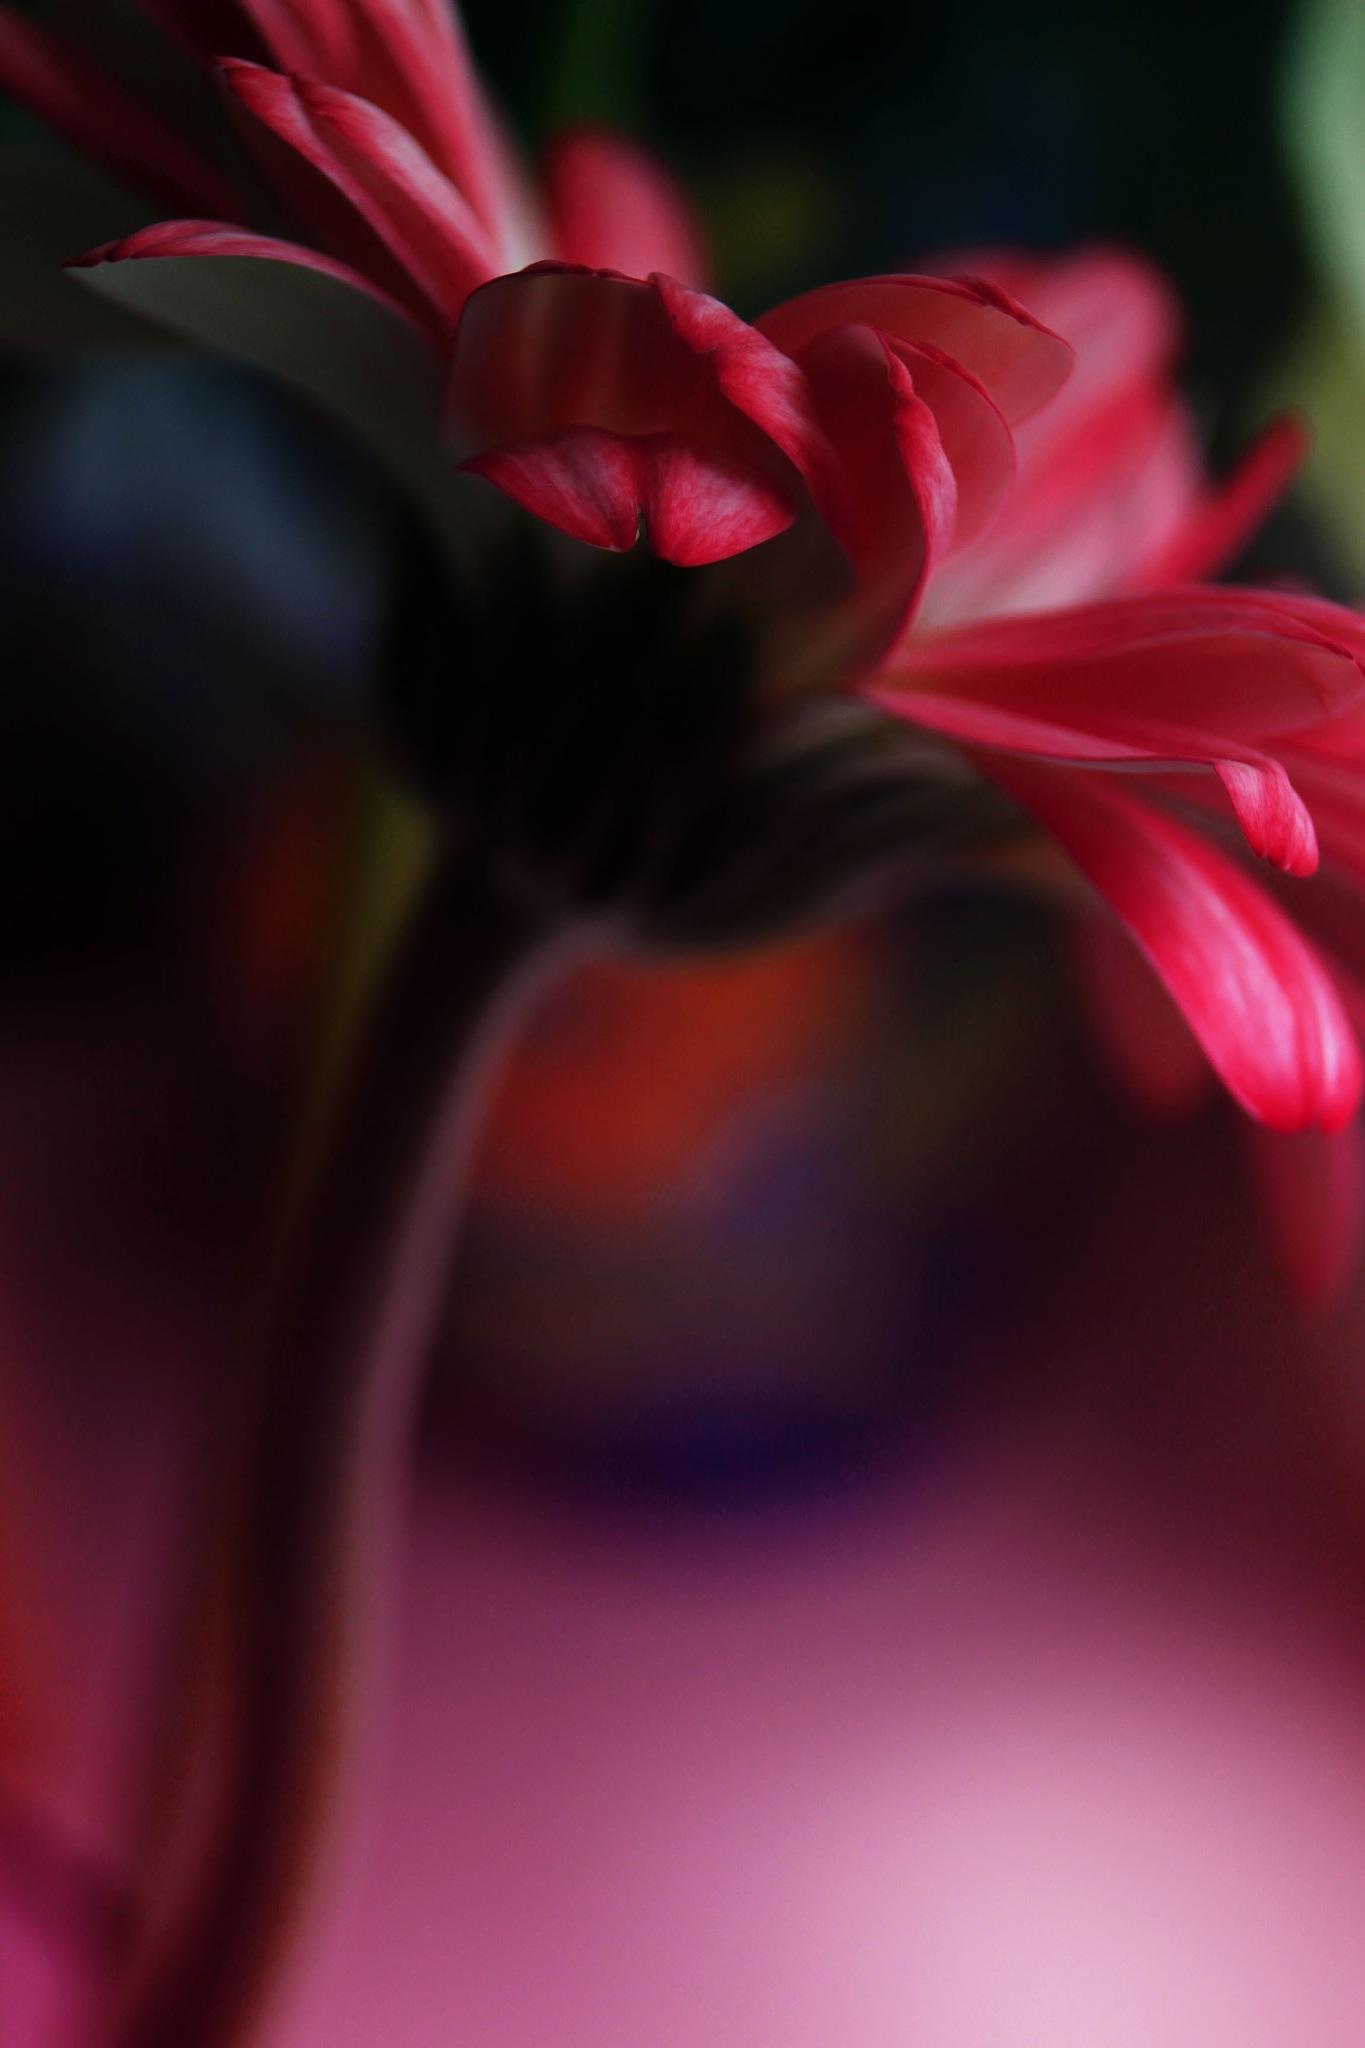 Vibrant Life by Mark Pemberton